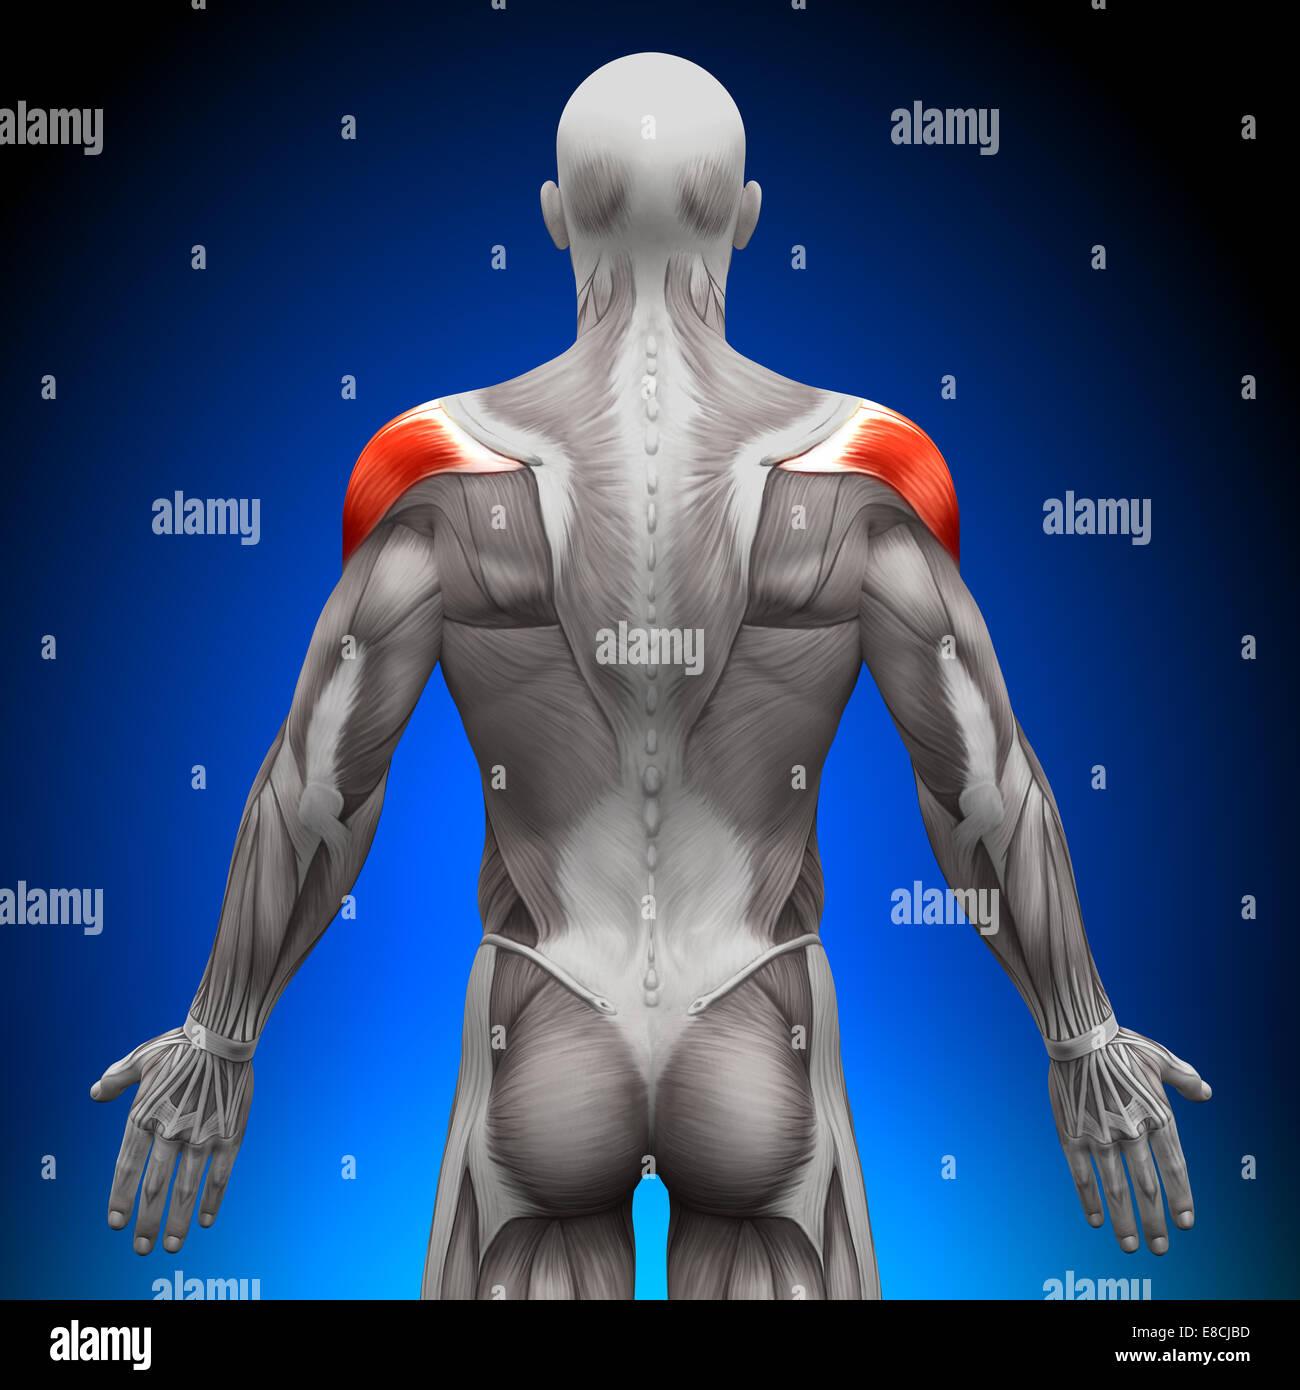 Shoulders Anatomy Muscles Stock Photo 74036577 Alamy